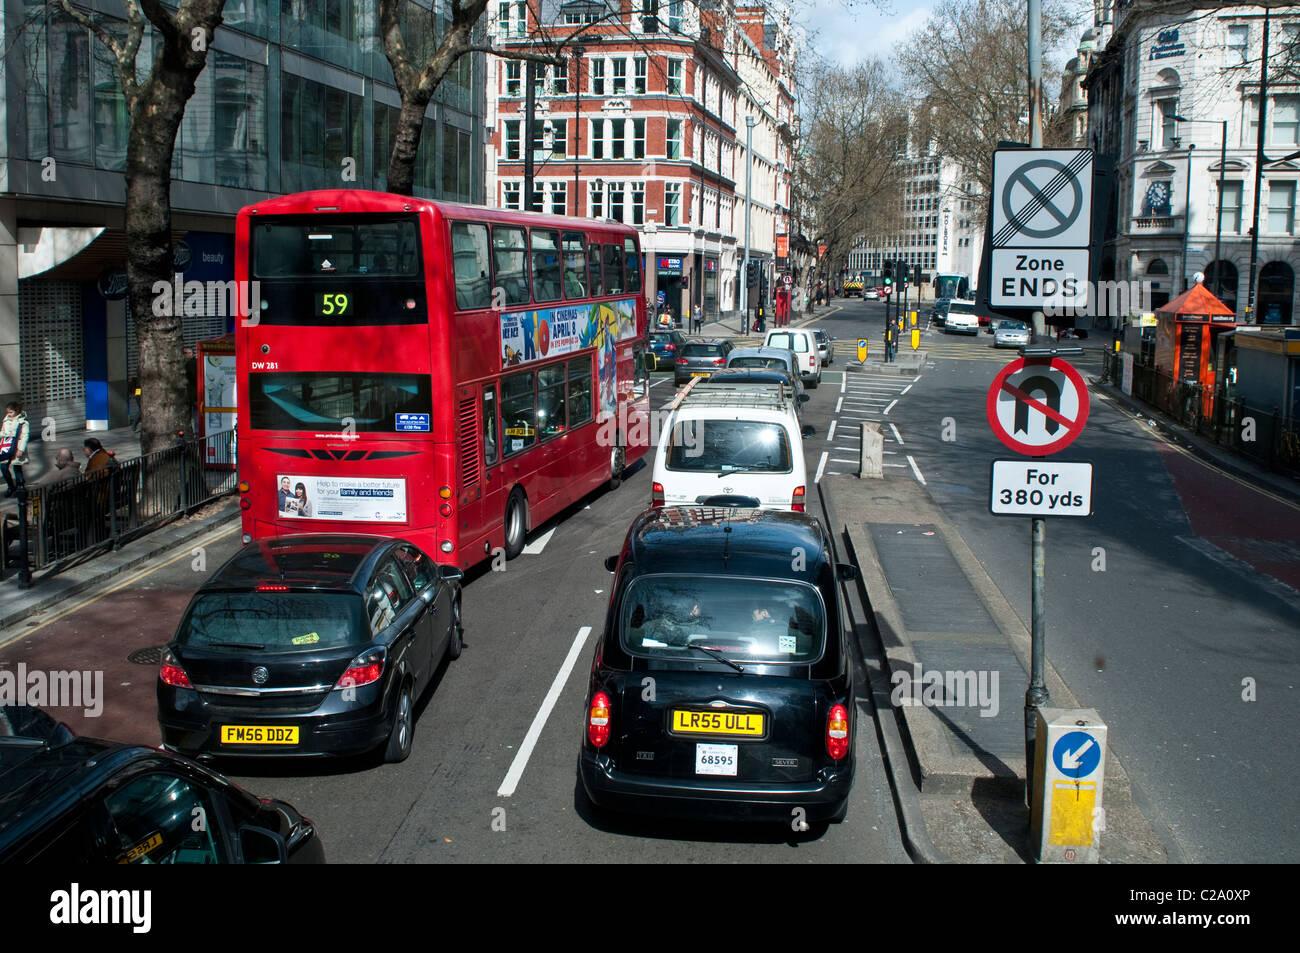 Traffic on Kingsway, Holborn, London, UK - Stock Image